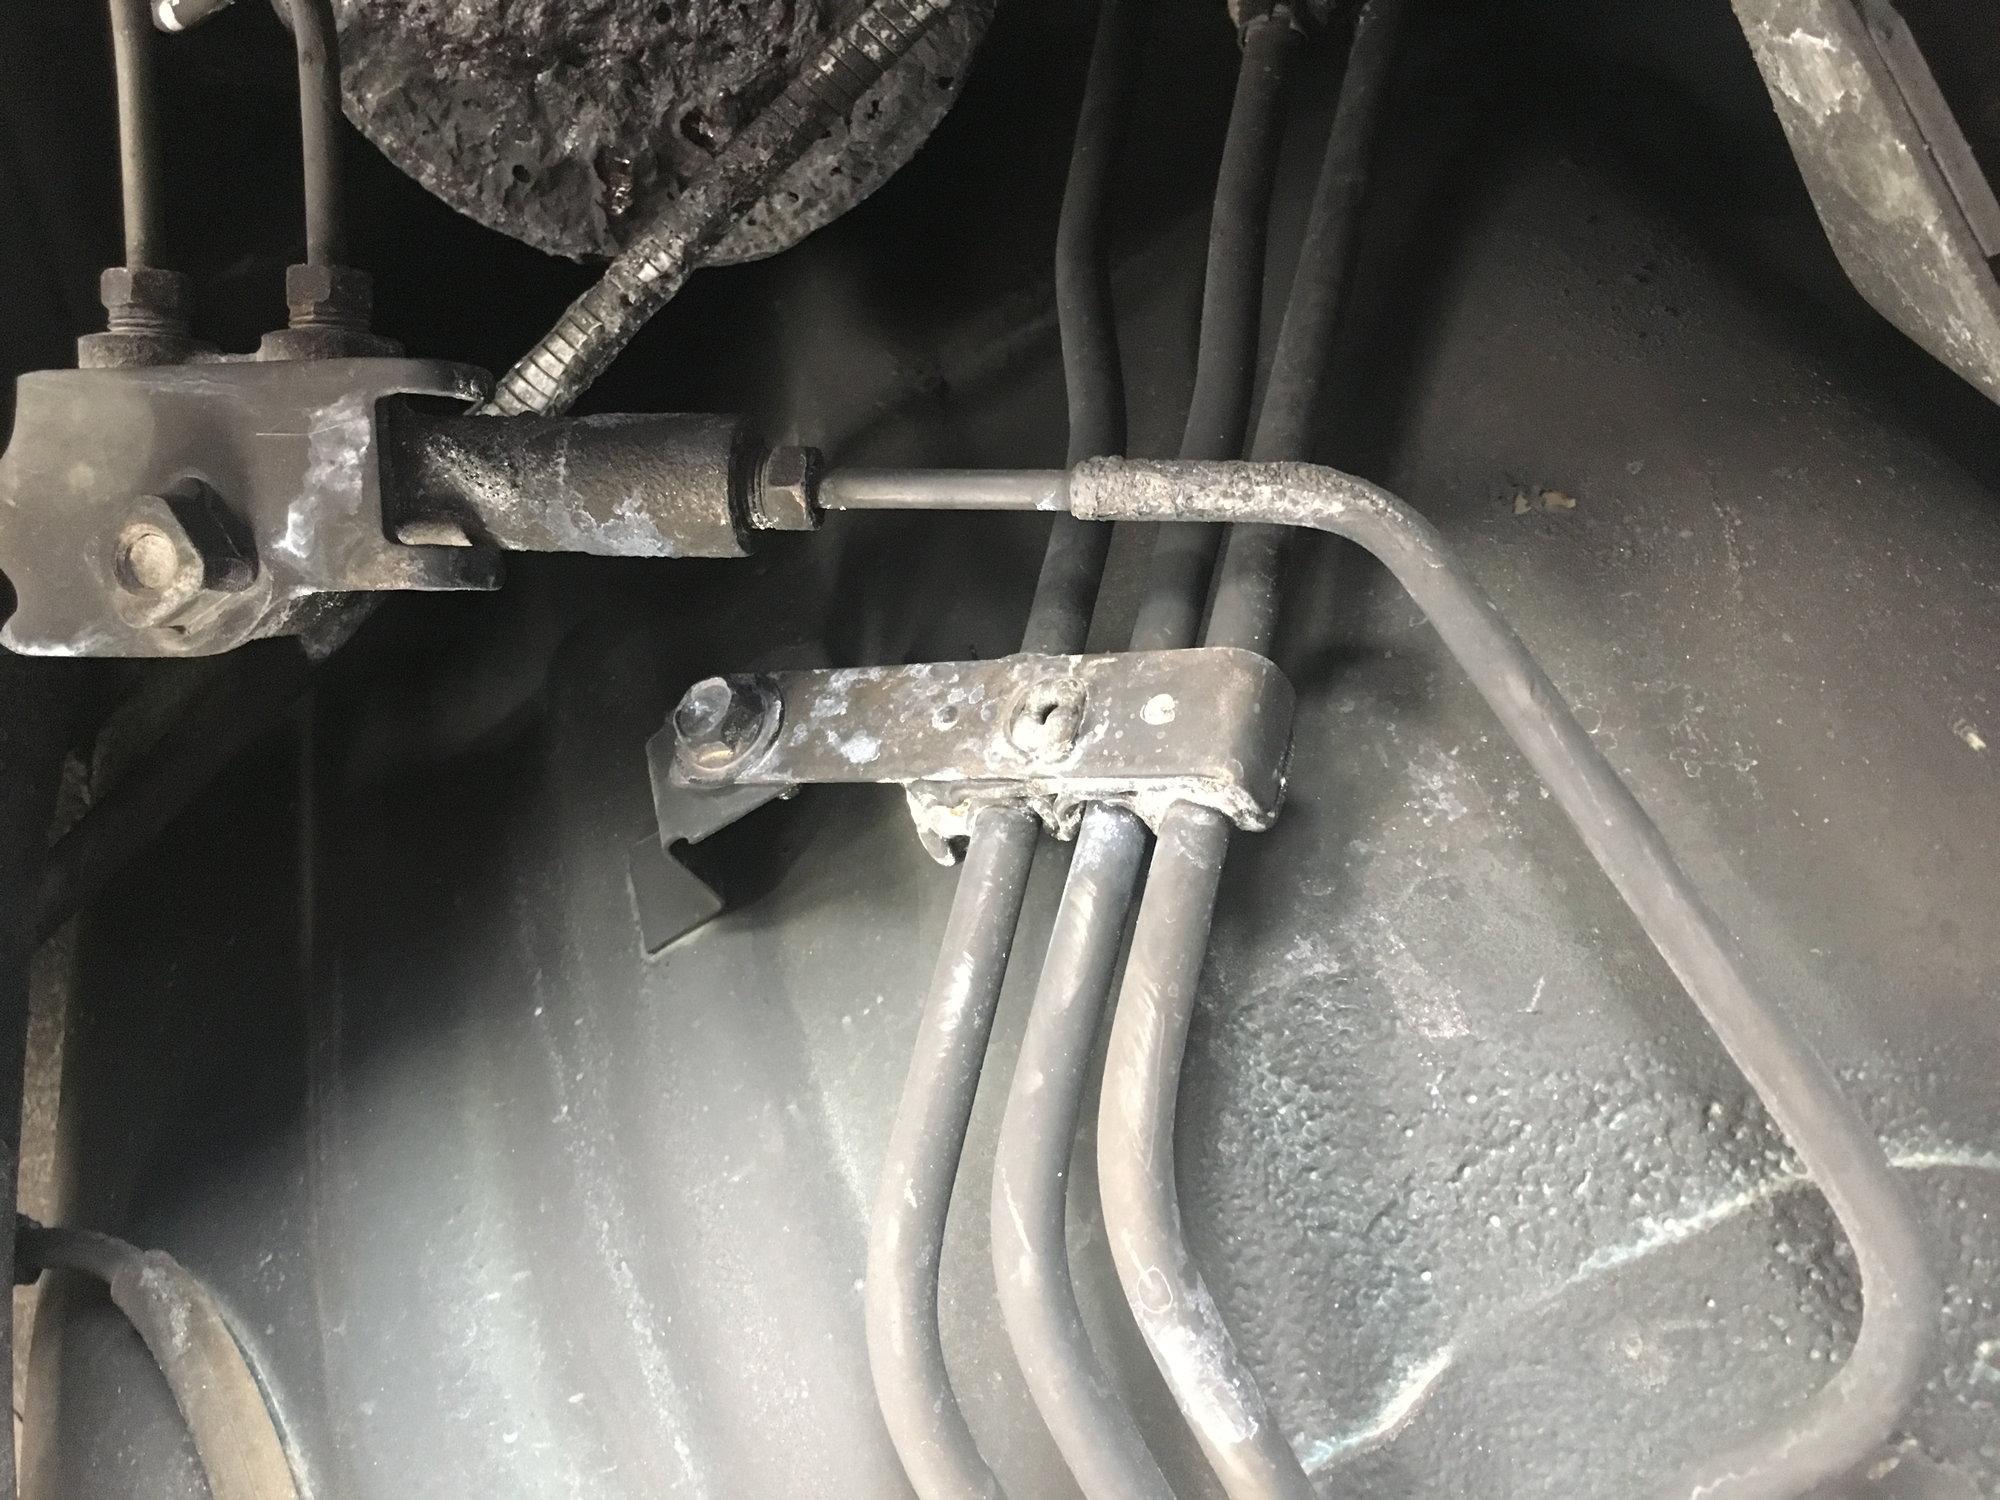 FD Fuel Line replacement - RX7Club com - Mazda RX7 Forum